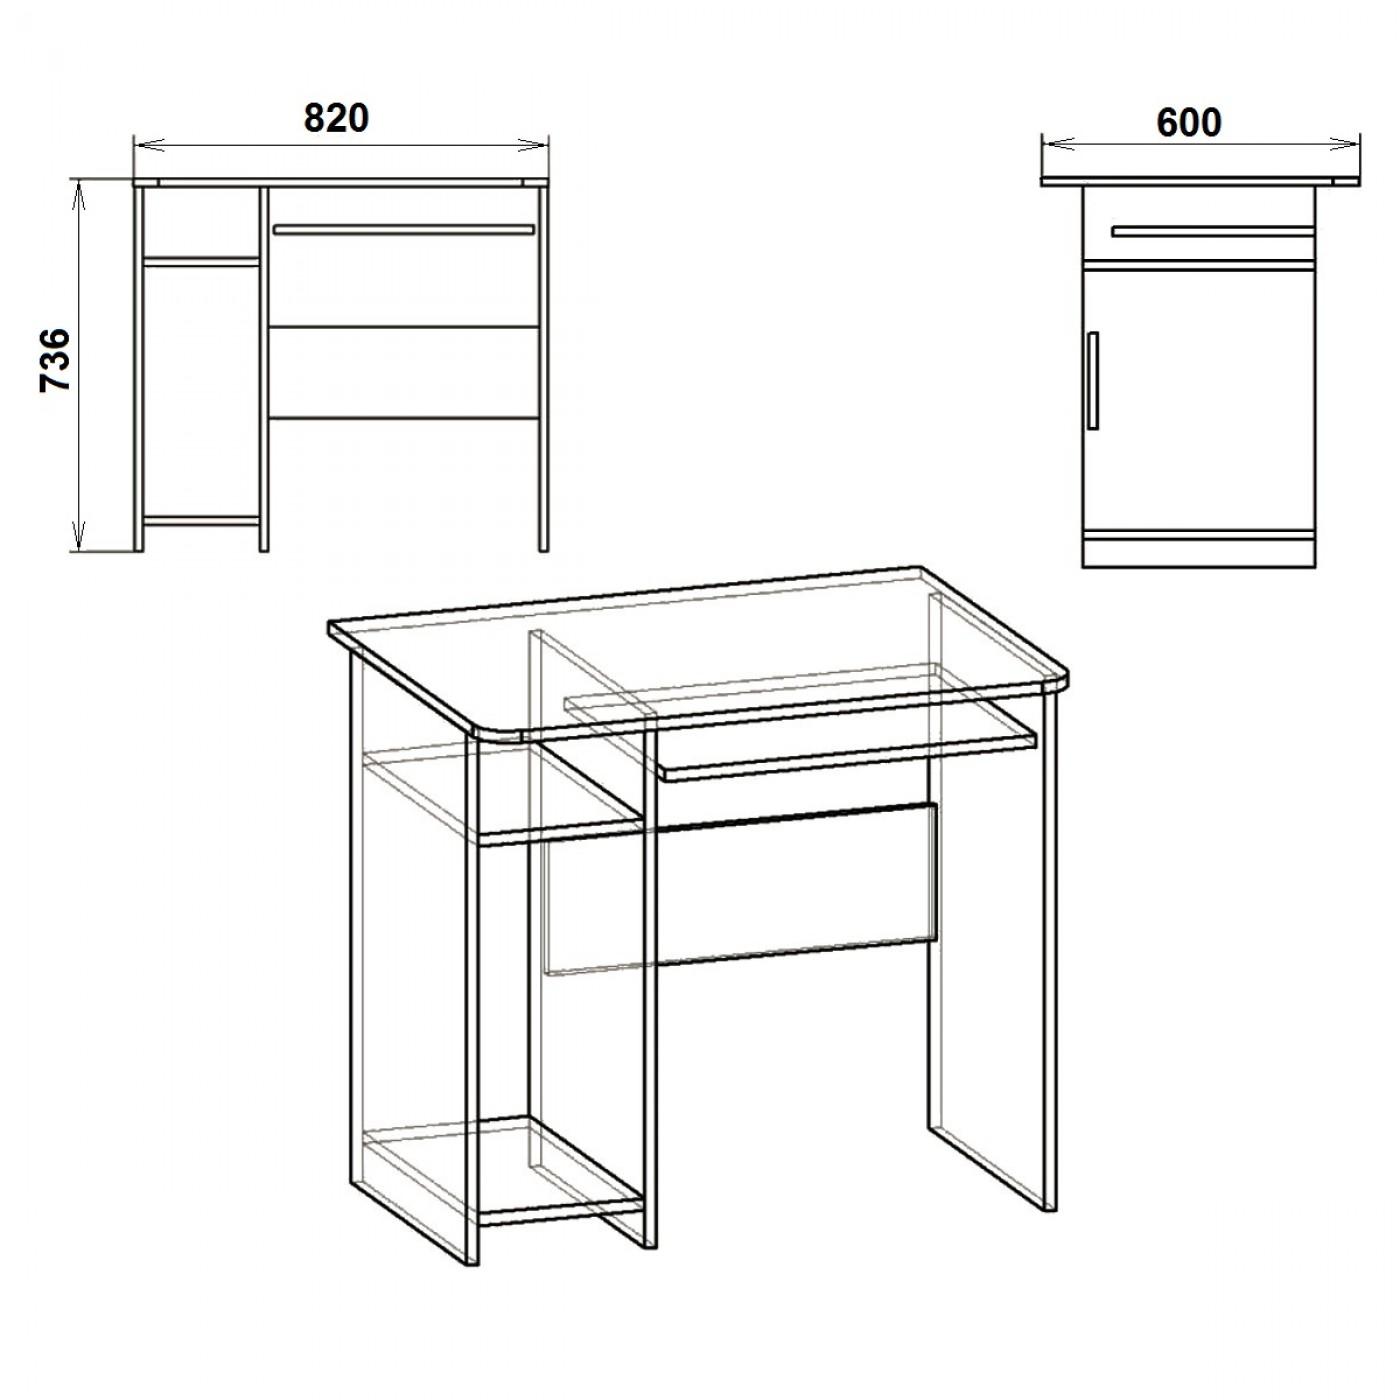 СКМ-12 стол компьютерный